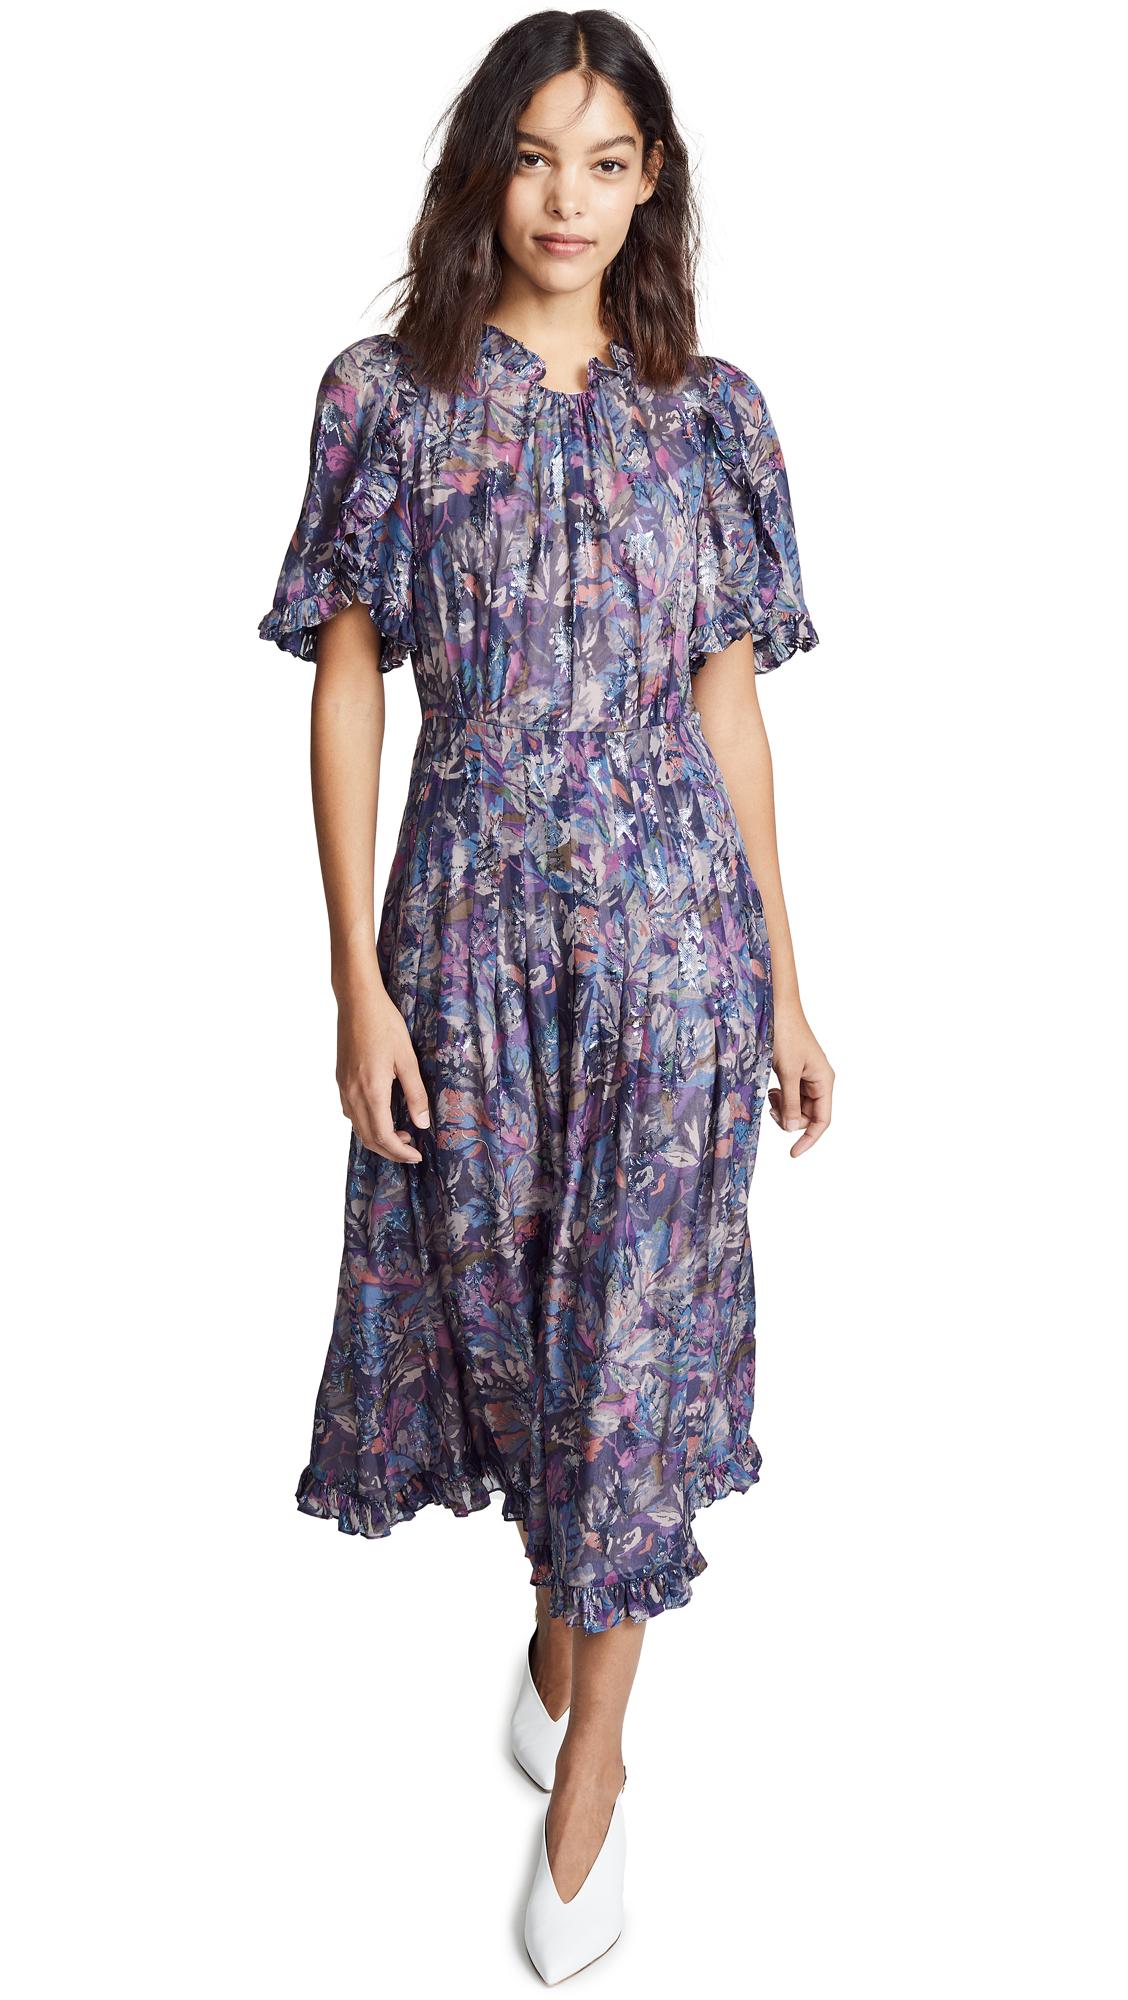 Giverny Metallic Detail Silk Chiffon Dress in Amethyst Combo